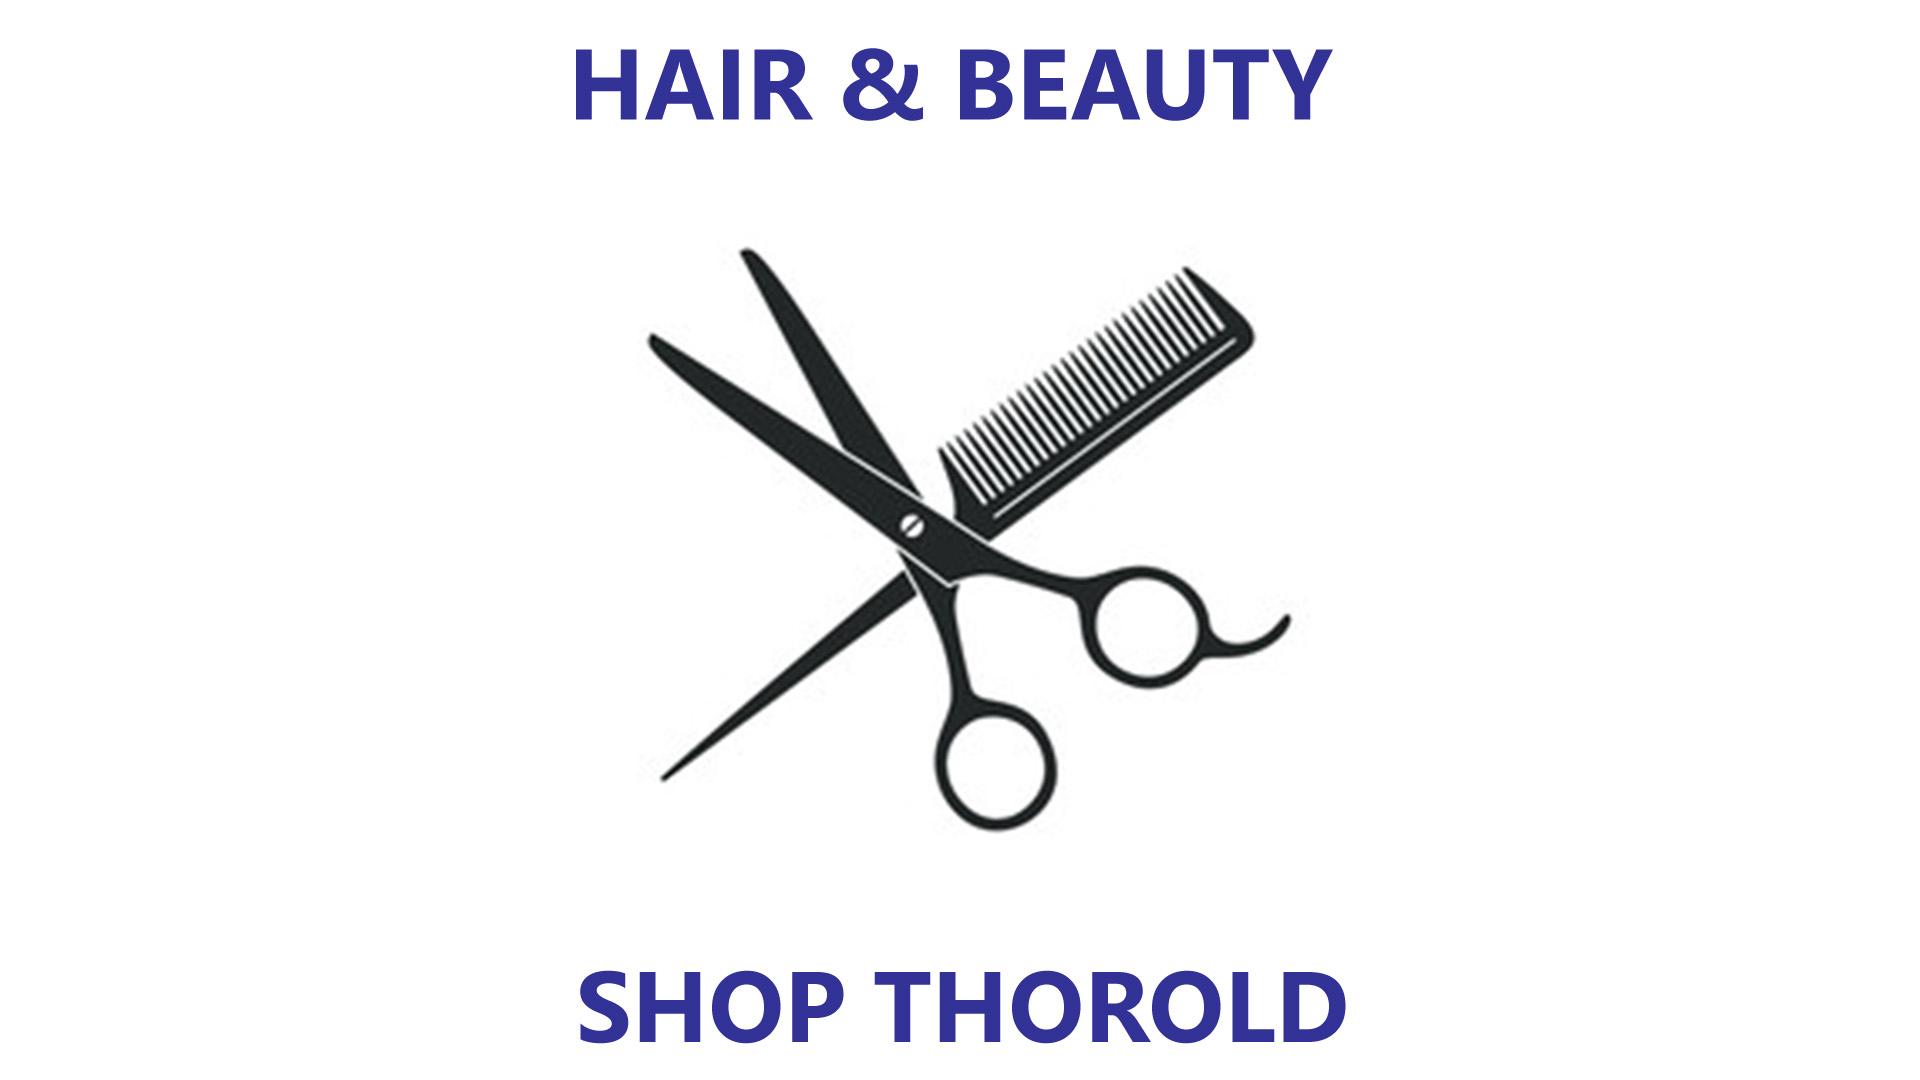 hairbeauty - shopthorold